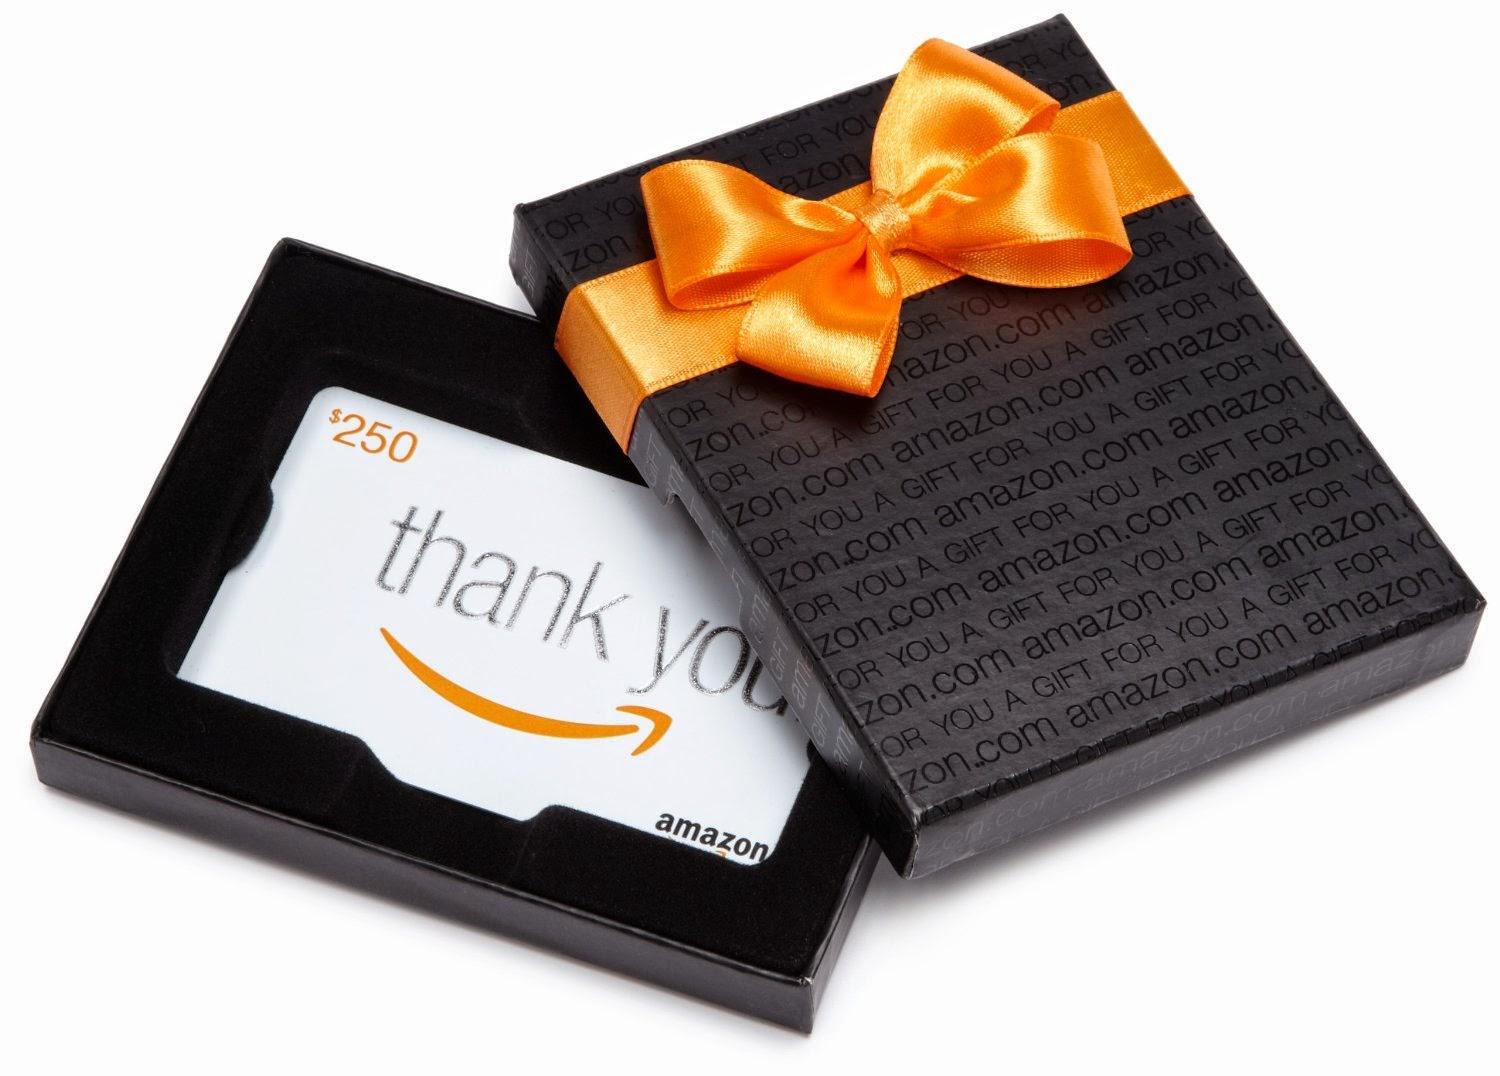 Amazon deals sign in